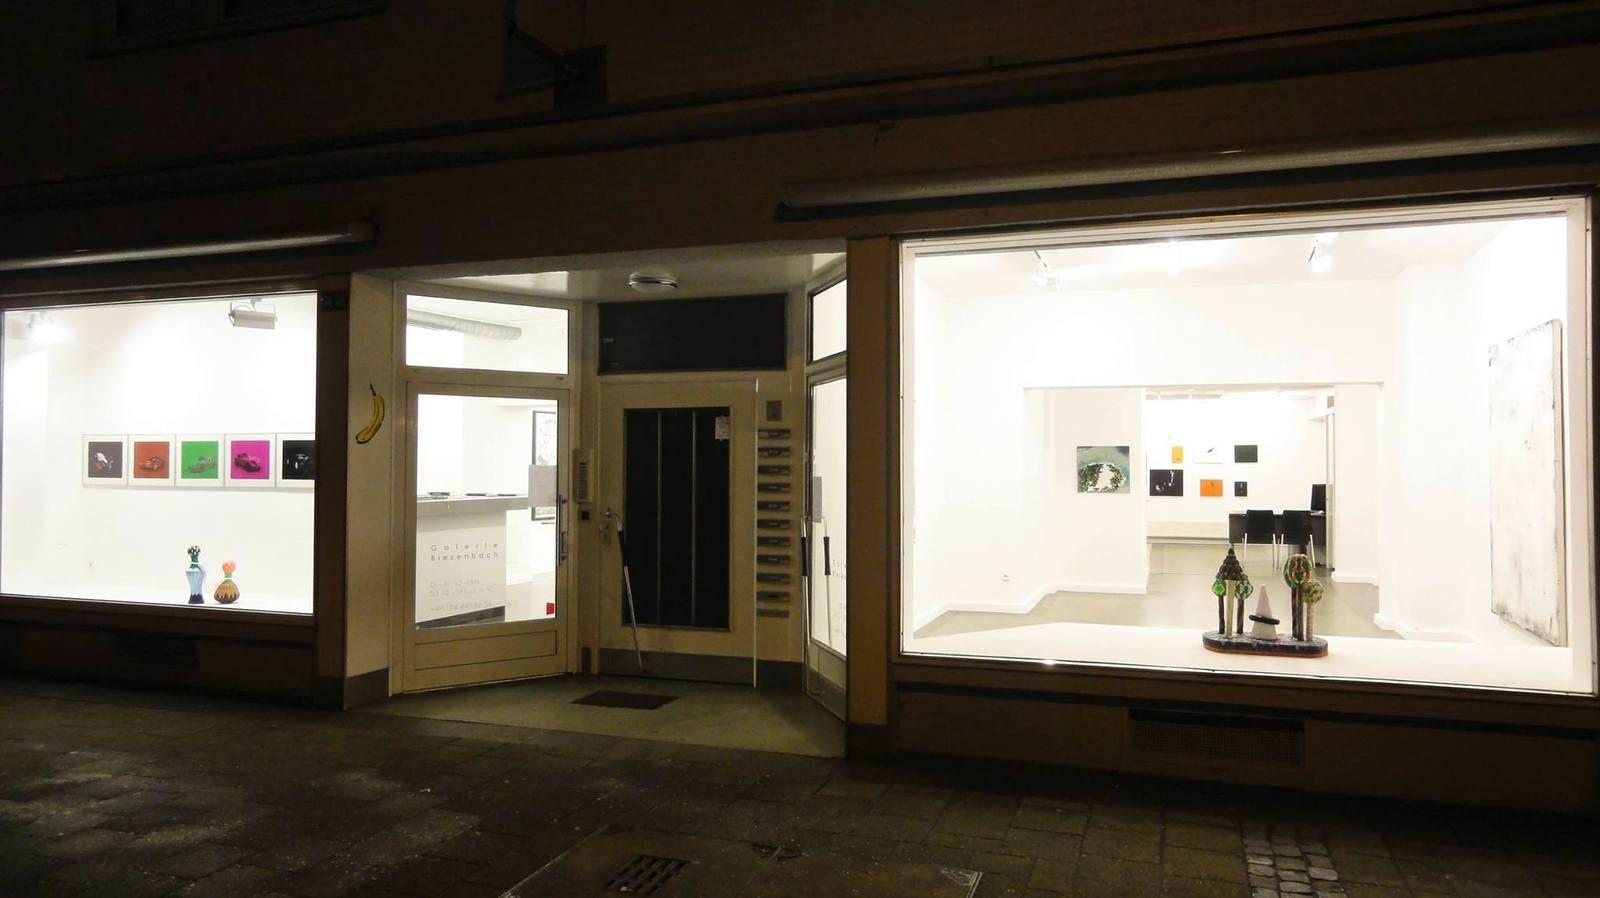 NATURE - ChangesFiveX Part Two - Vues d'expo - Galerie Biesenbach, Cologne (Allemagne)